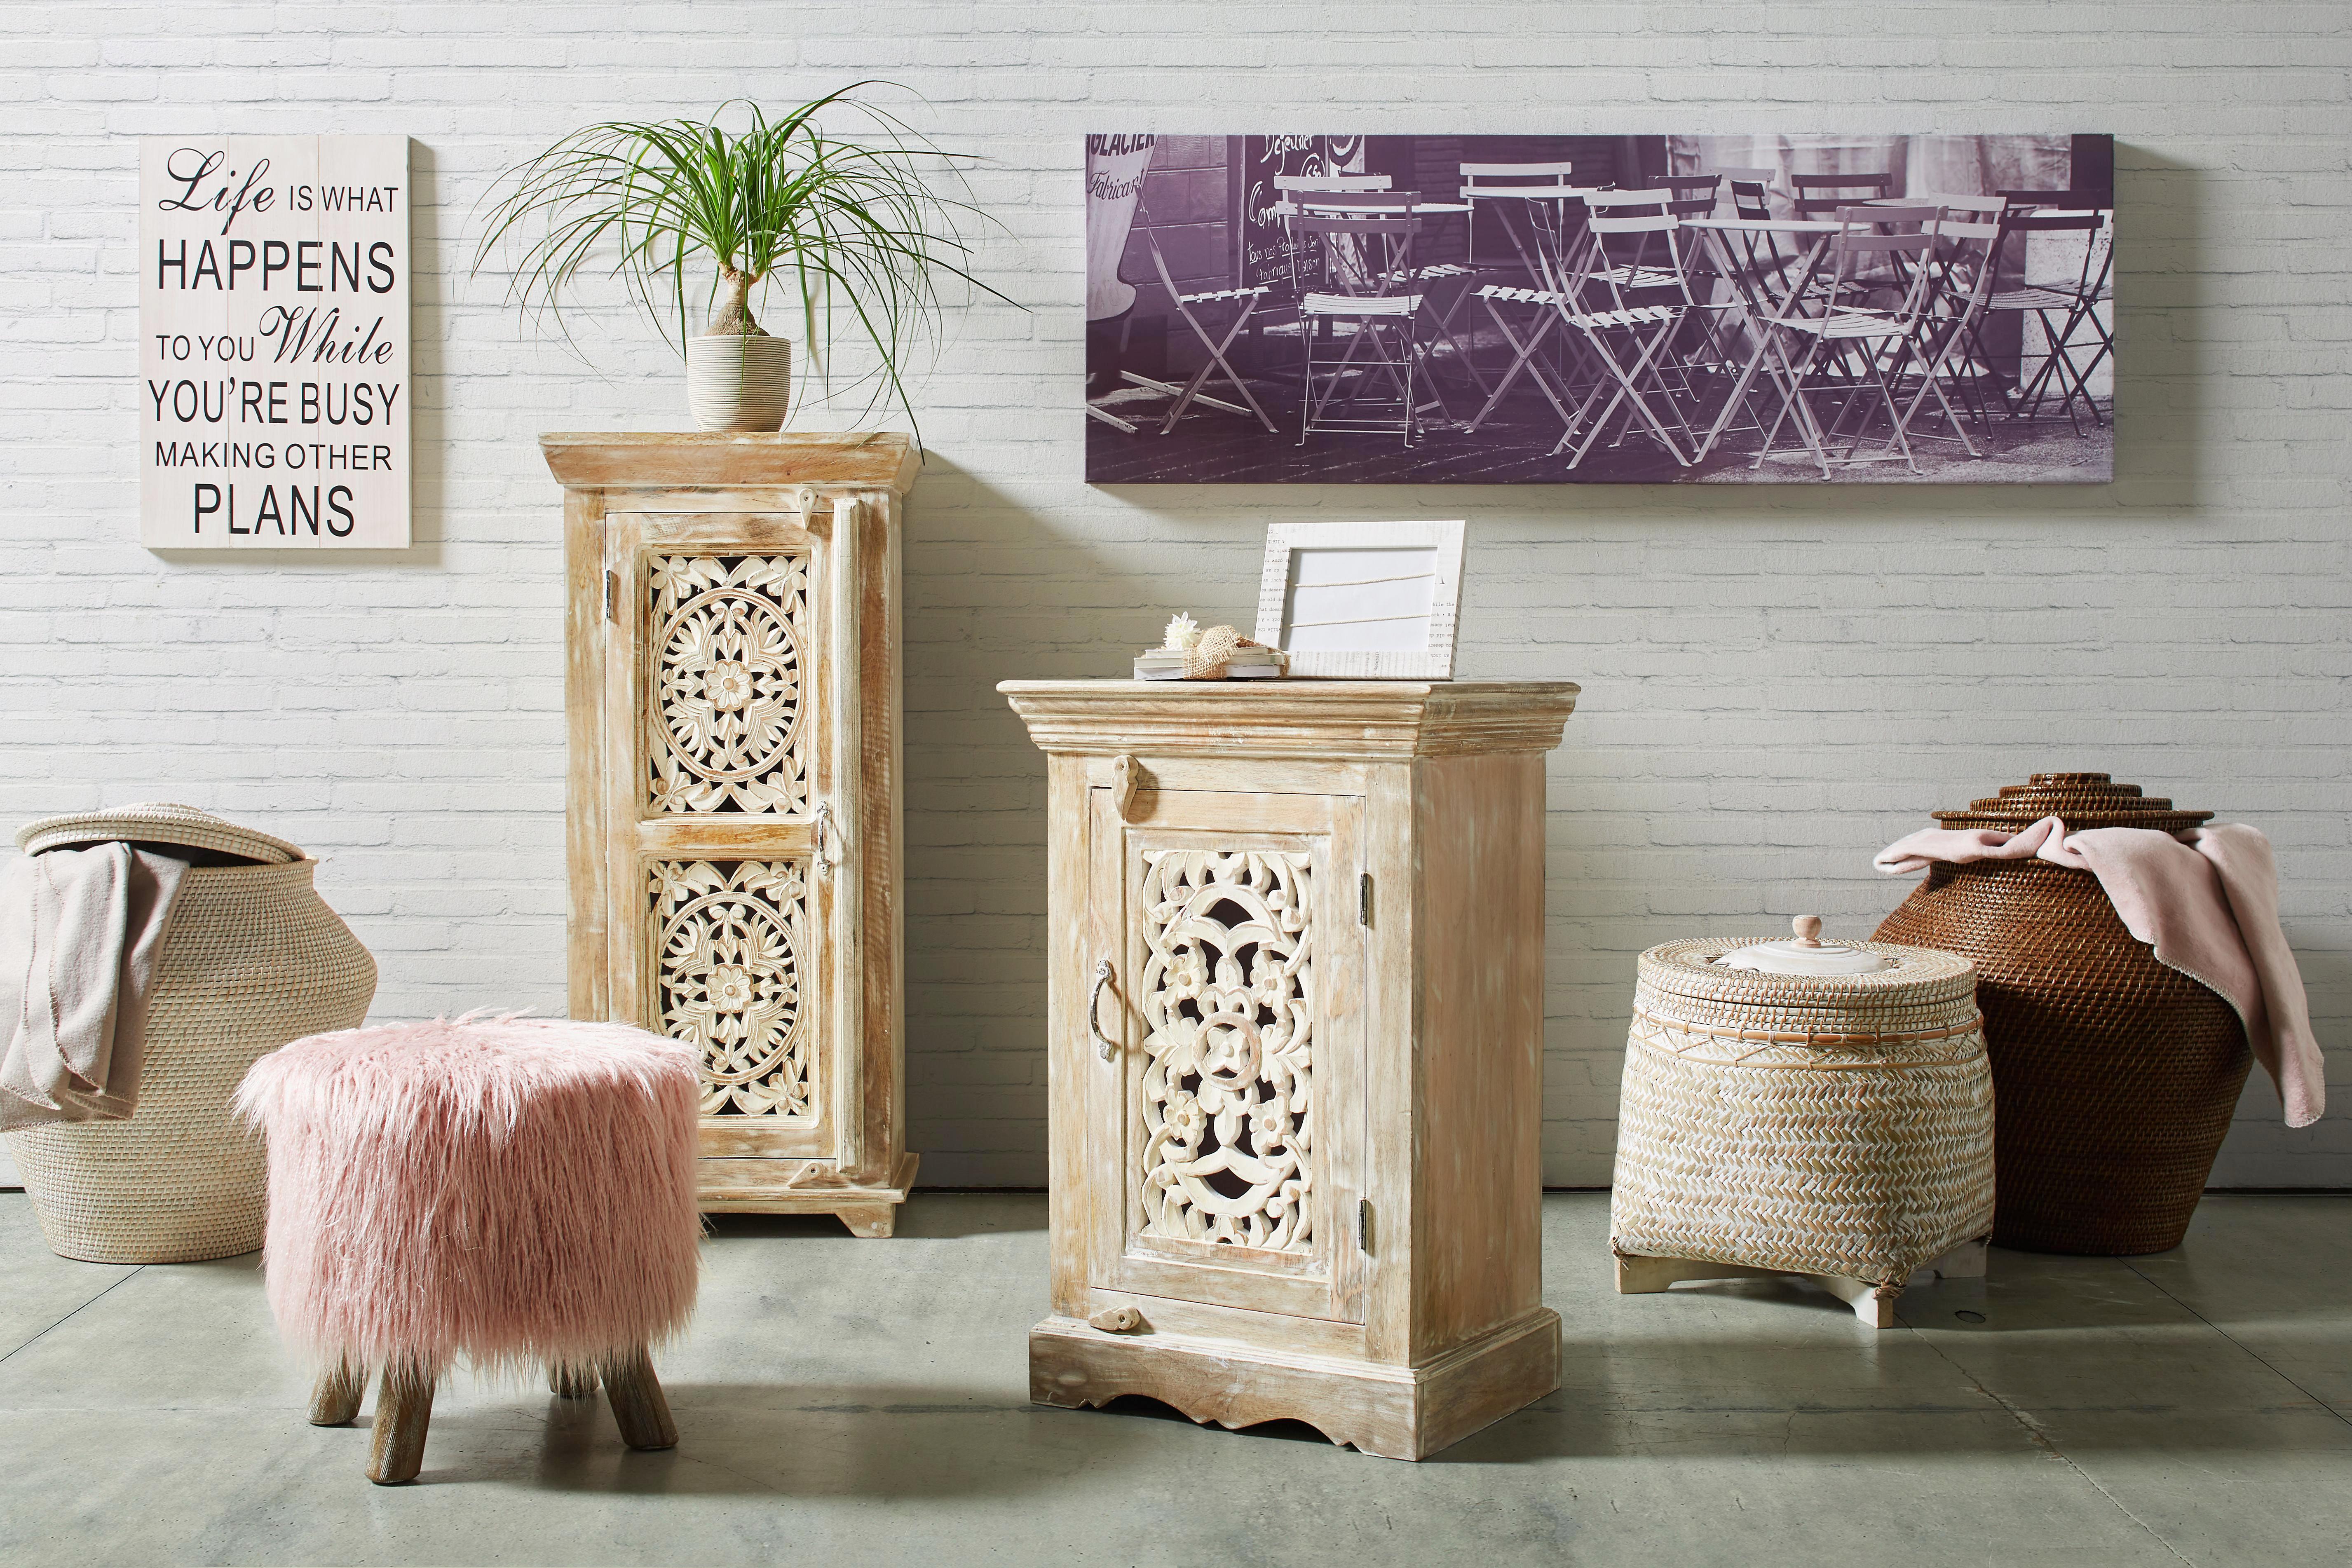 Hocker in Rosa - Rosa/Weiß, MODERN, Holz/Textil (38/39cm) - MODERN LIVING